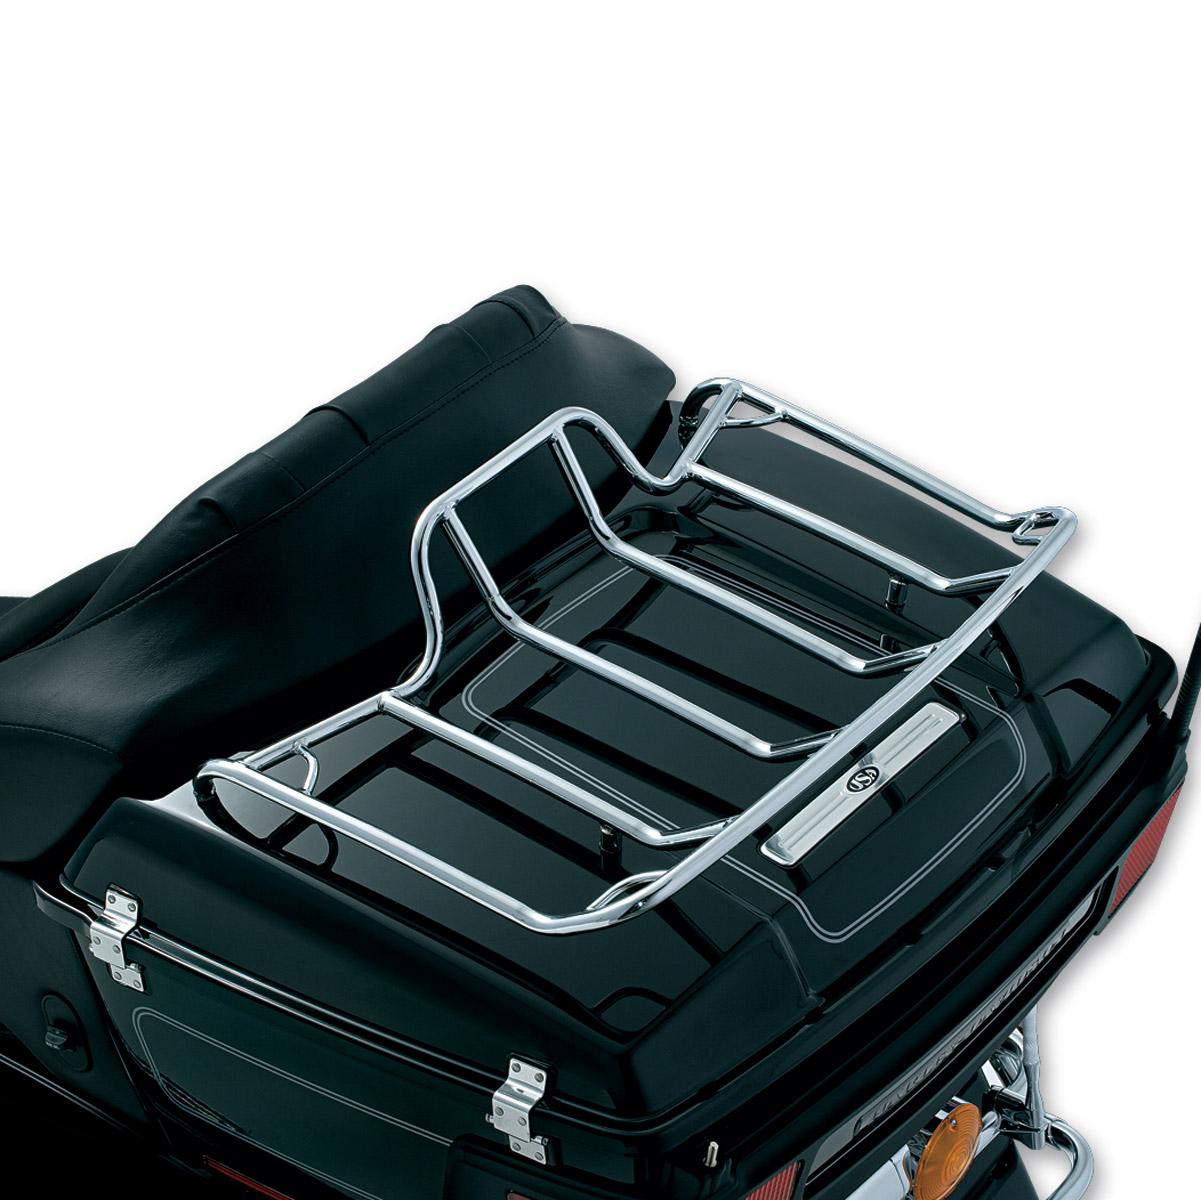 kuryakyn luggage rack for h-d tour-pak | 850-166 | j&p cycles